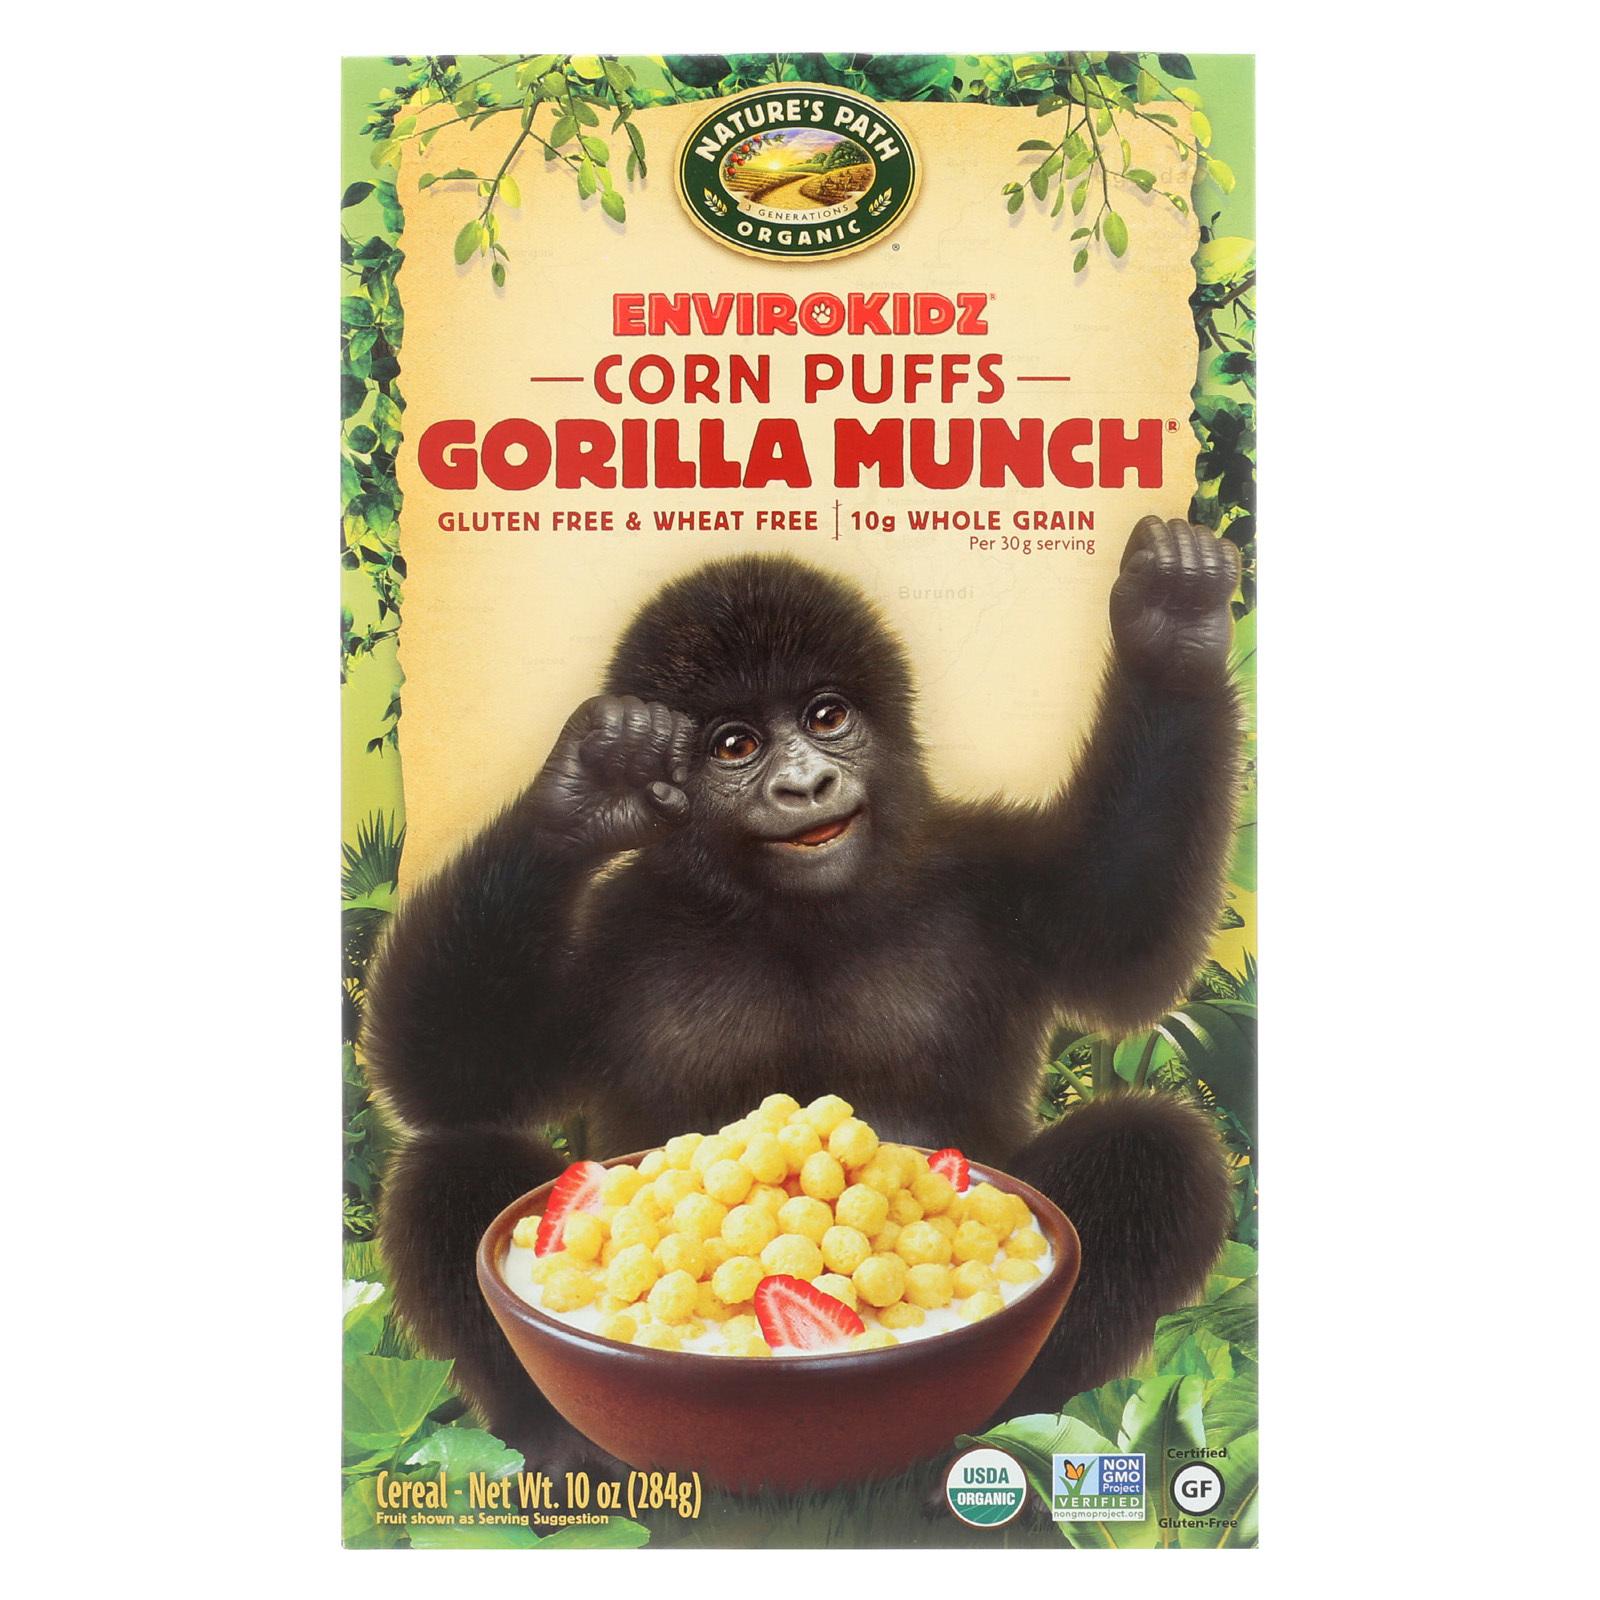 Envirokidz Organic Gorilla Munch - Corn Puffs - 10 oz